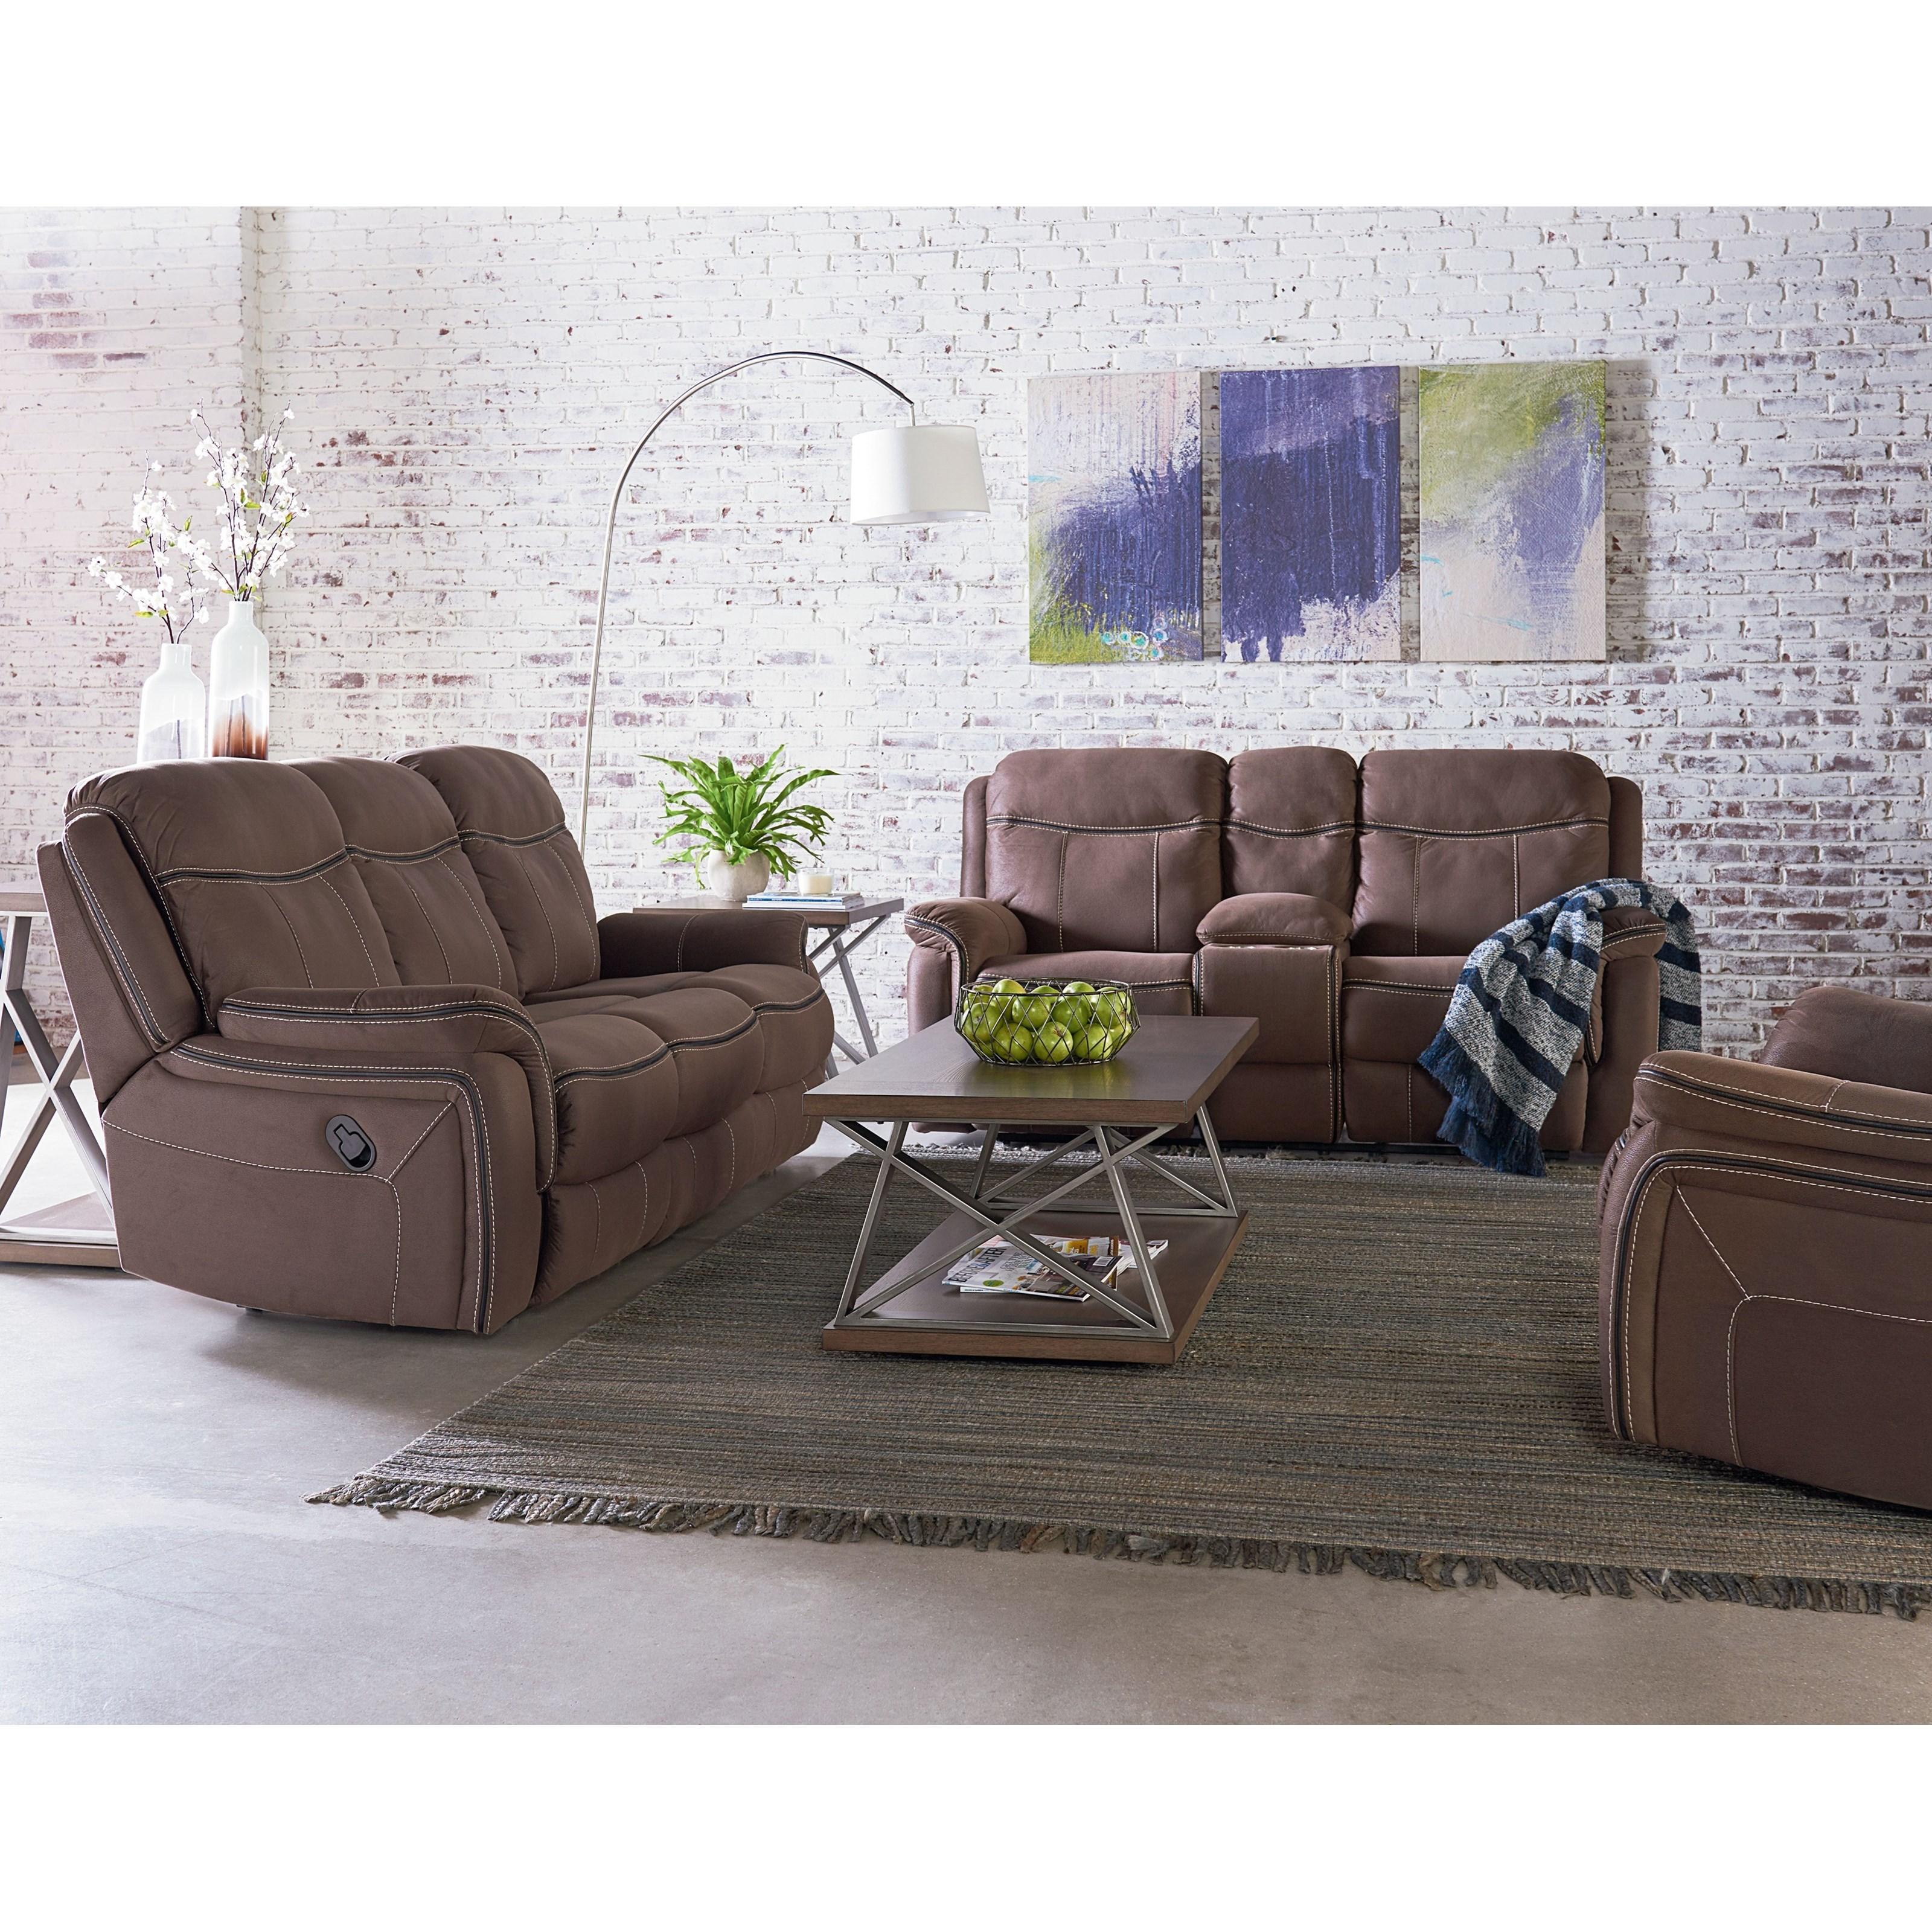 Standard Furniture Champion Reclining Living Room Group Olinde 39 S Furniture Reclining Living